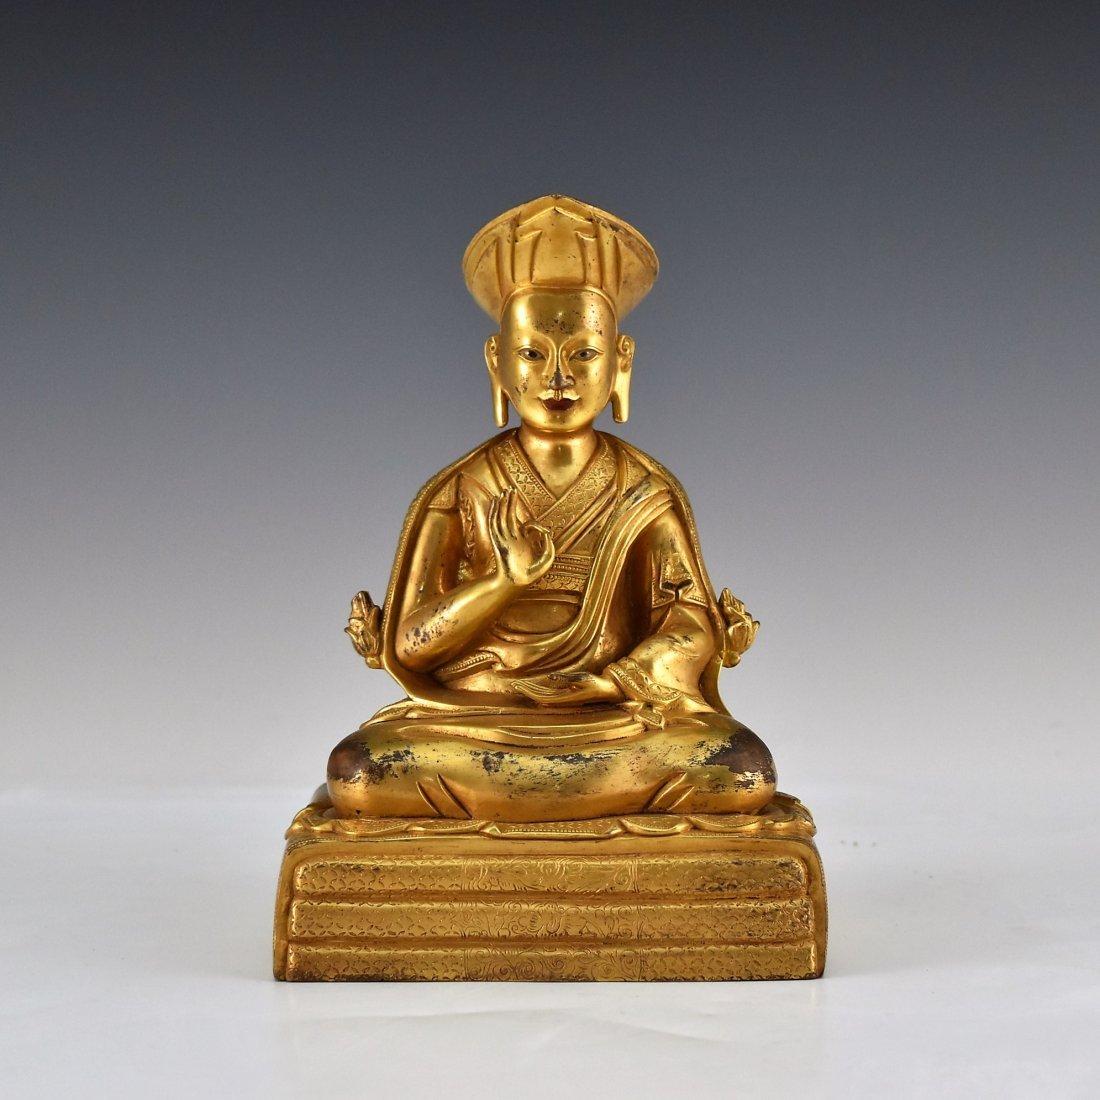 A GILT BRONZE BUDDHA FIGURE OF LAMA TSONDRU TASHI